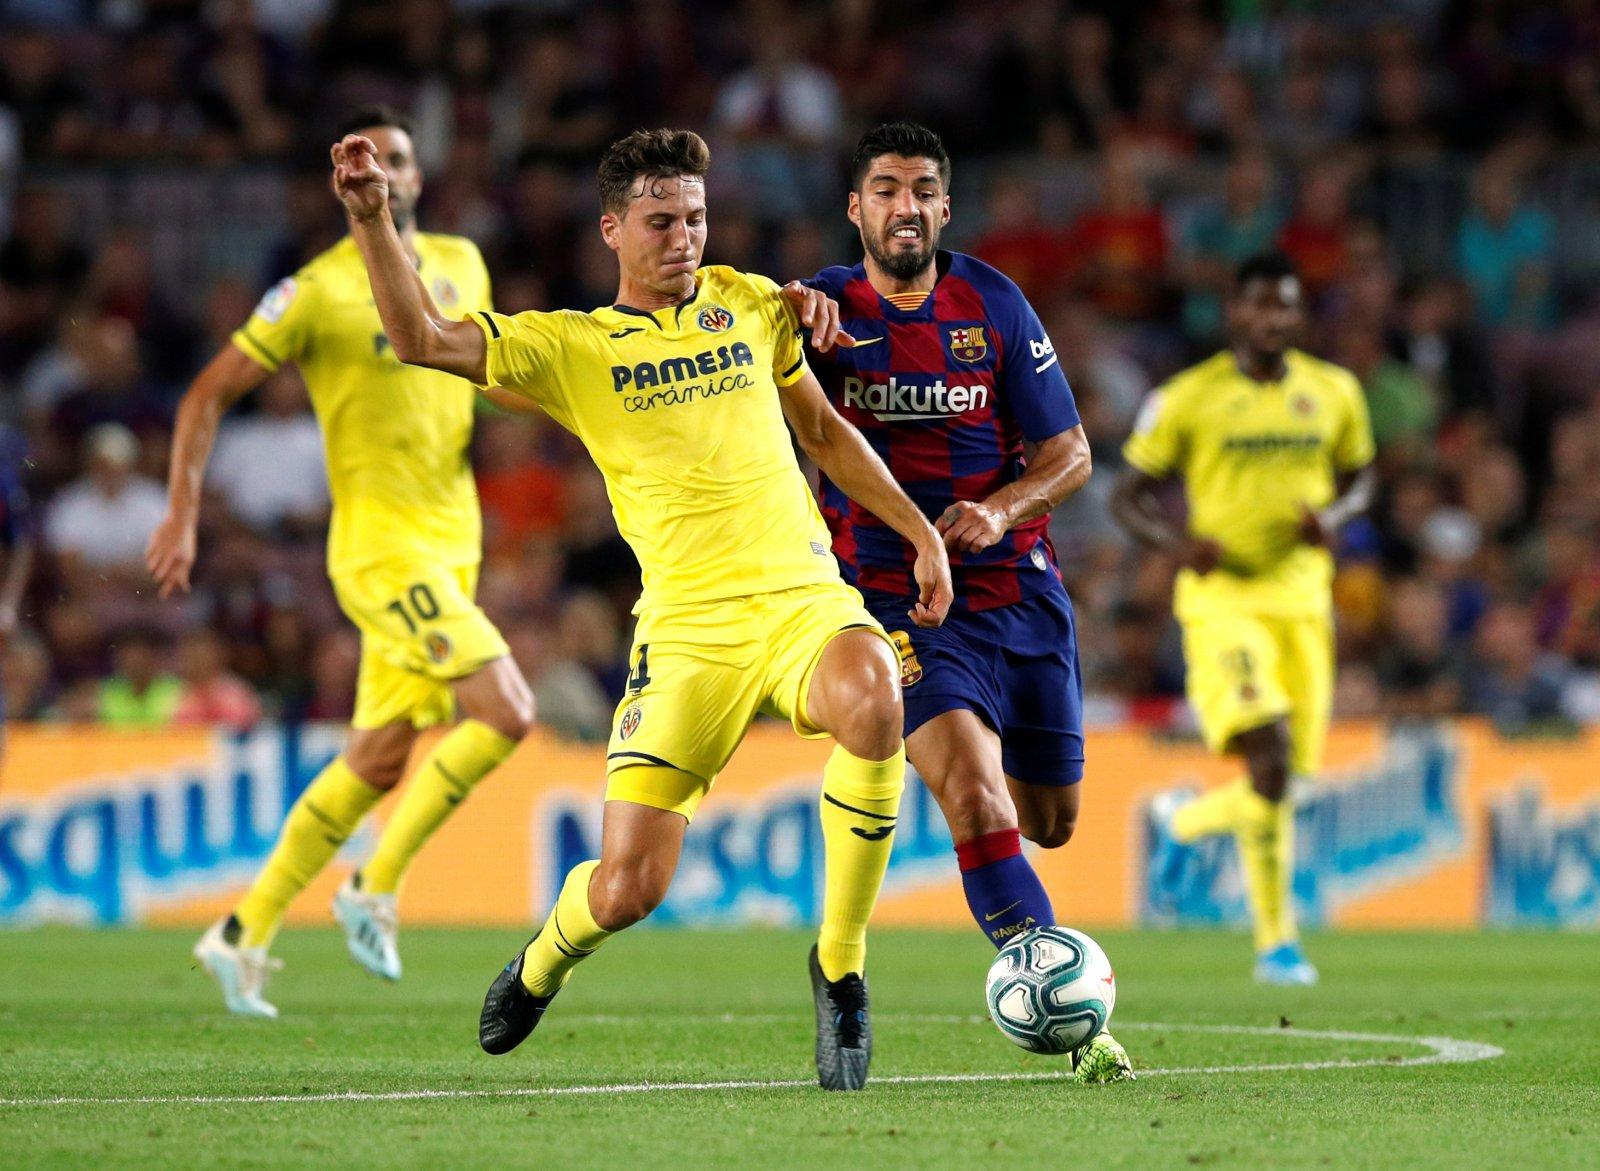 Pau Torres enjoyed a fine 2019/20 season with Villarreal